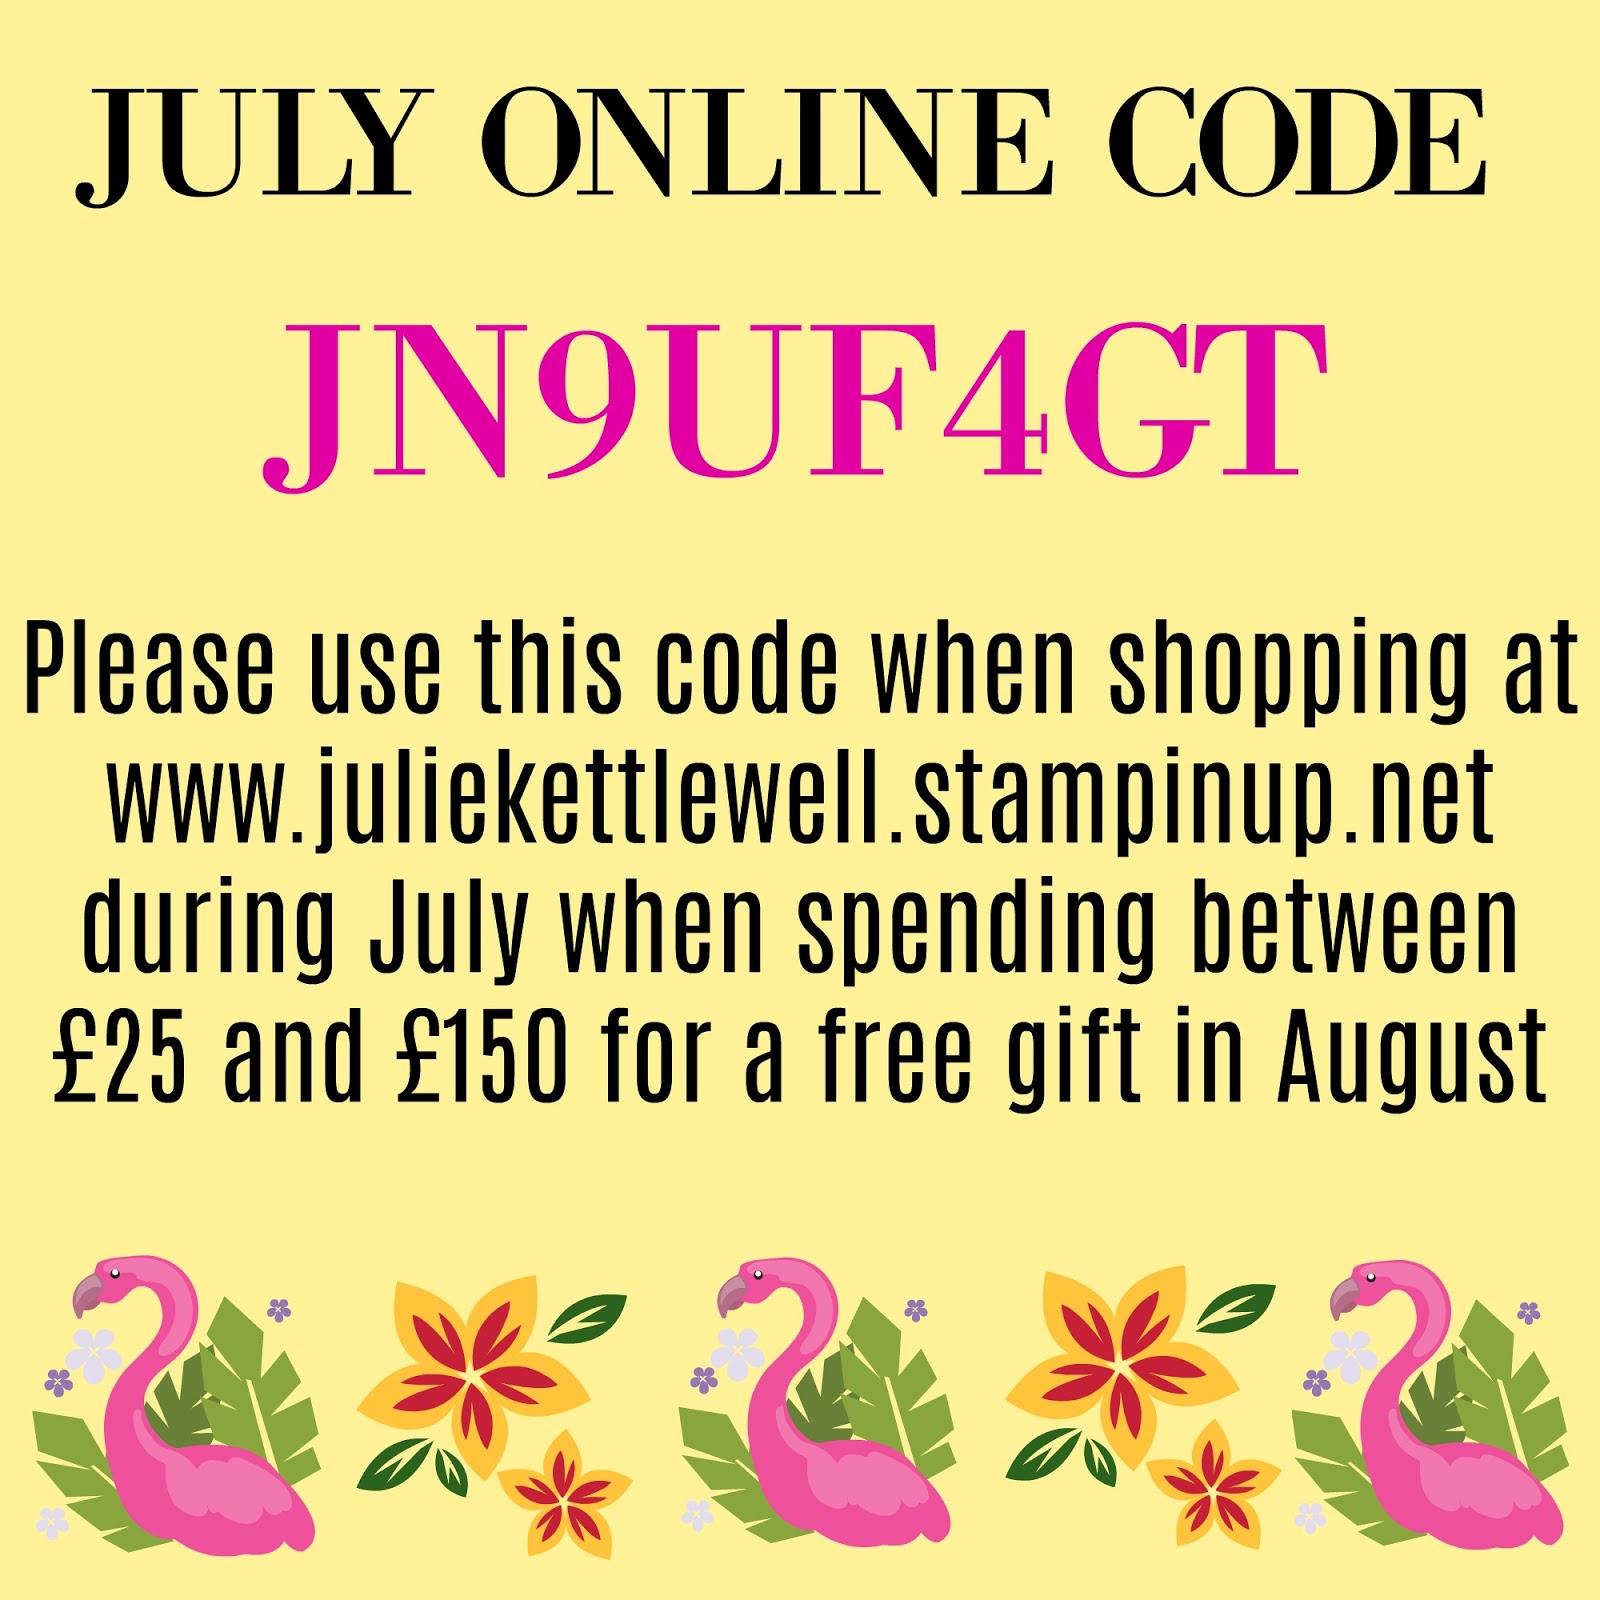 Stampin up coupon code